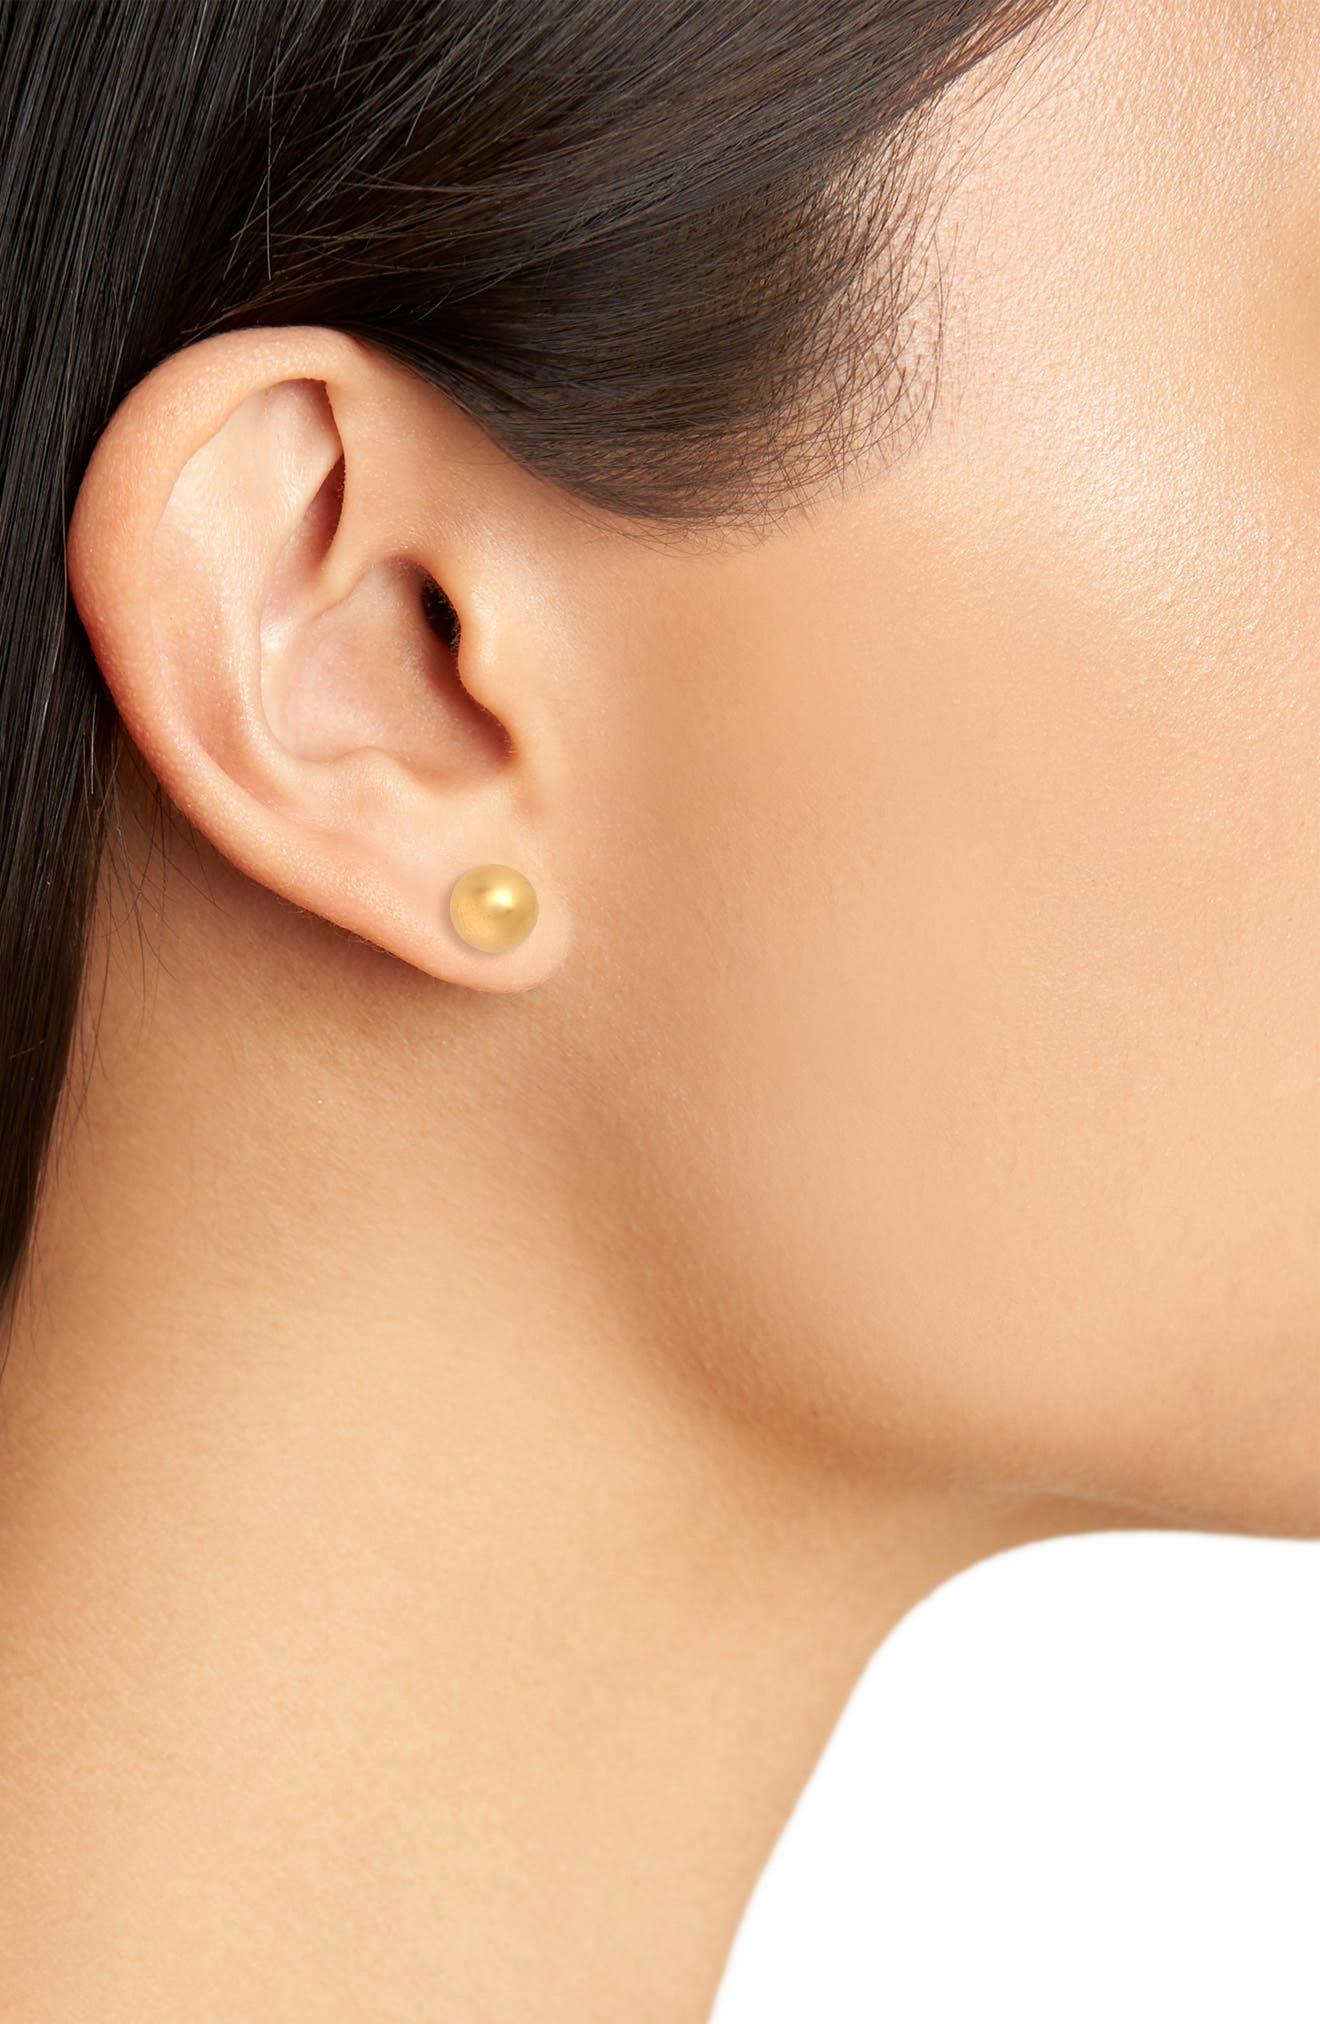 14K Gold Ball Stud Earrings,                             Alternate thumbnail 2, color,                             Yellow Gold